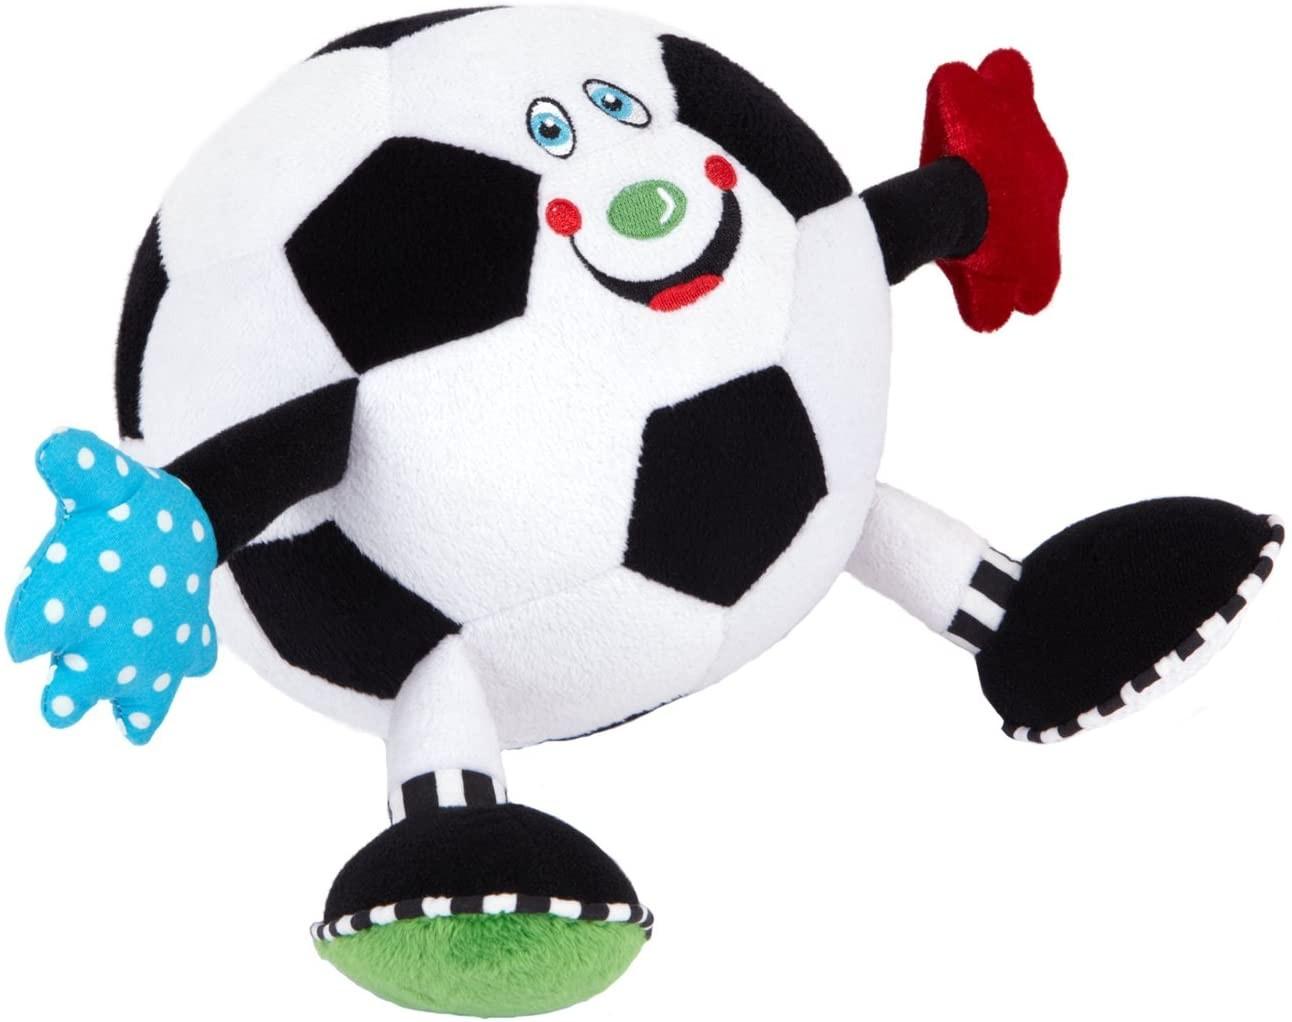 Mon premier ballon de foot...